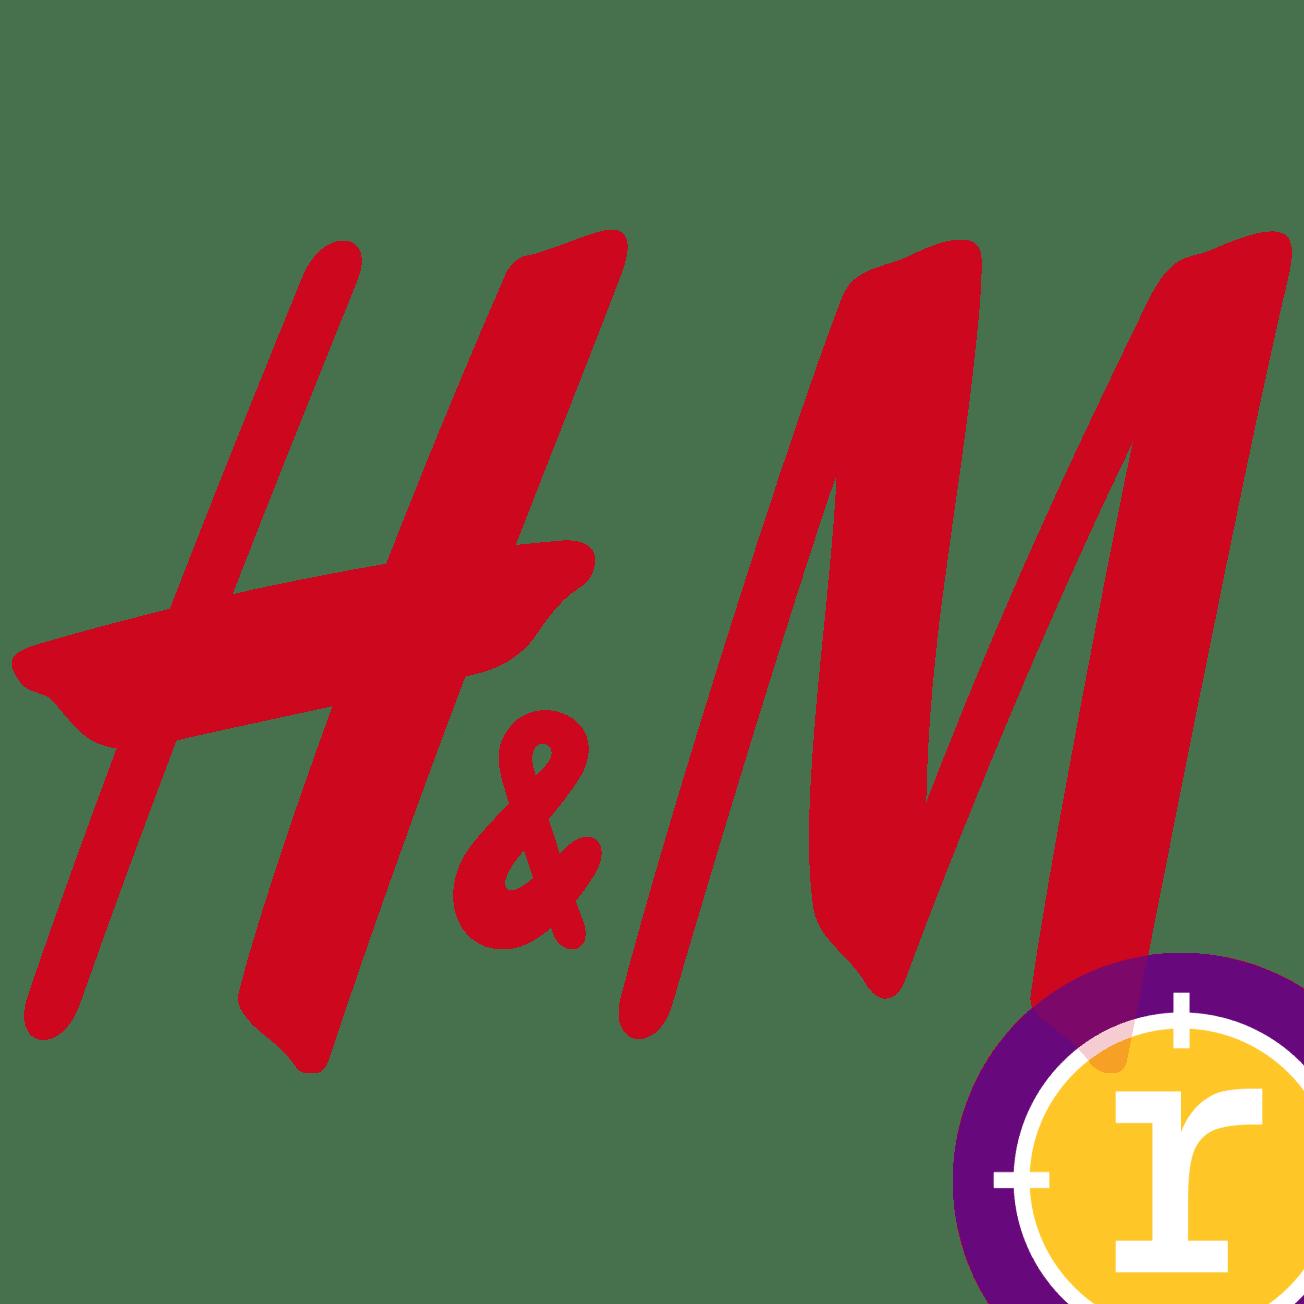 2bd9605b2ea H&M rabatkoder - 70% rabat - jul 2019 - Rabble